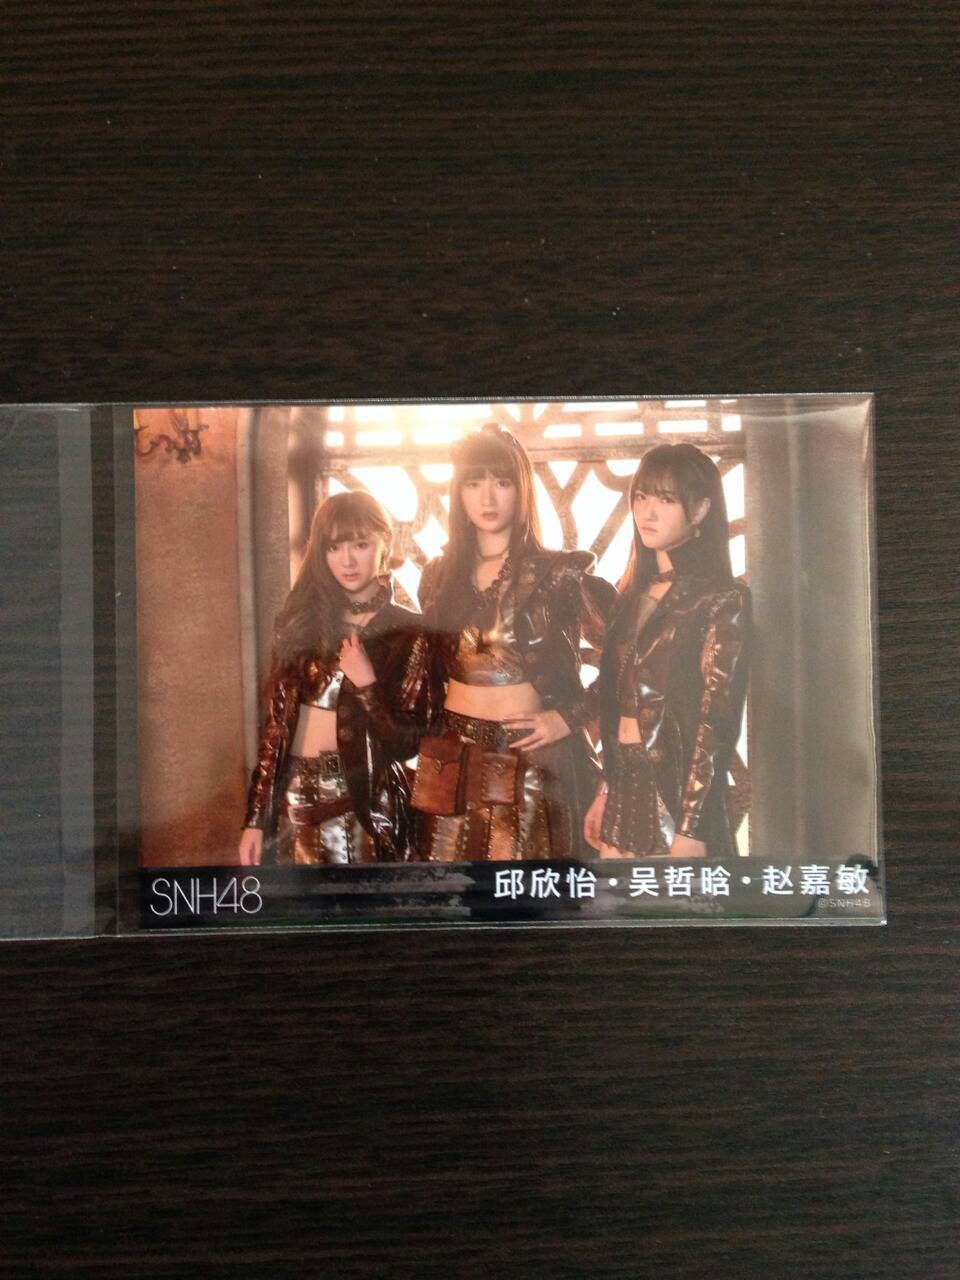 【SNH48】《呜吒(UZA)》の生写真が届きました!吳哲晗、邱欣怡、趙嘉敏の3ショット写真など紹介